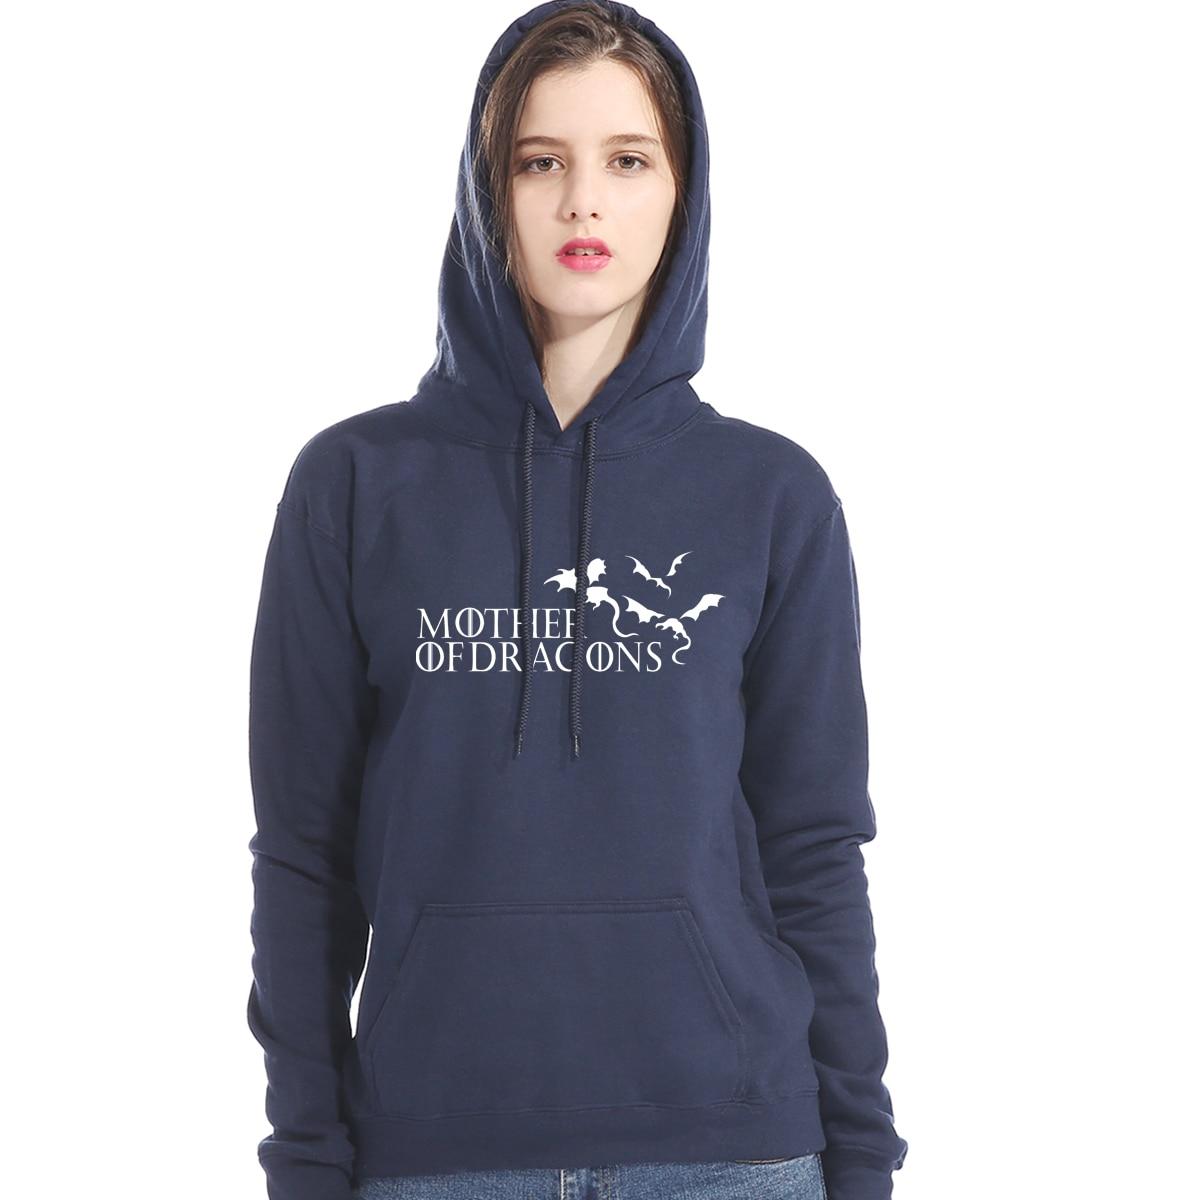 Women's Hoodies Streetwear 2019 New Fashion Autumn Winter Coat Fleece Hoody Lady Gothic Top Game Of Thrones Sweatshirt For Women